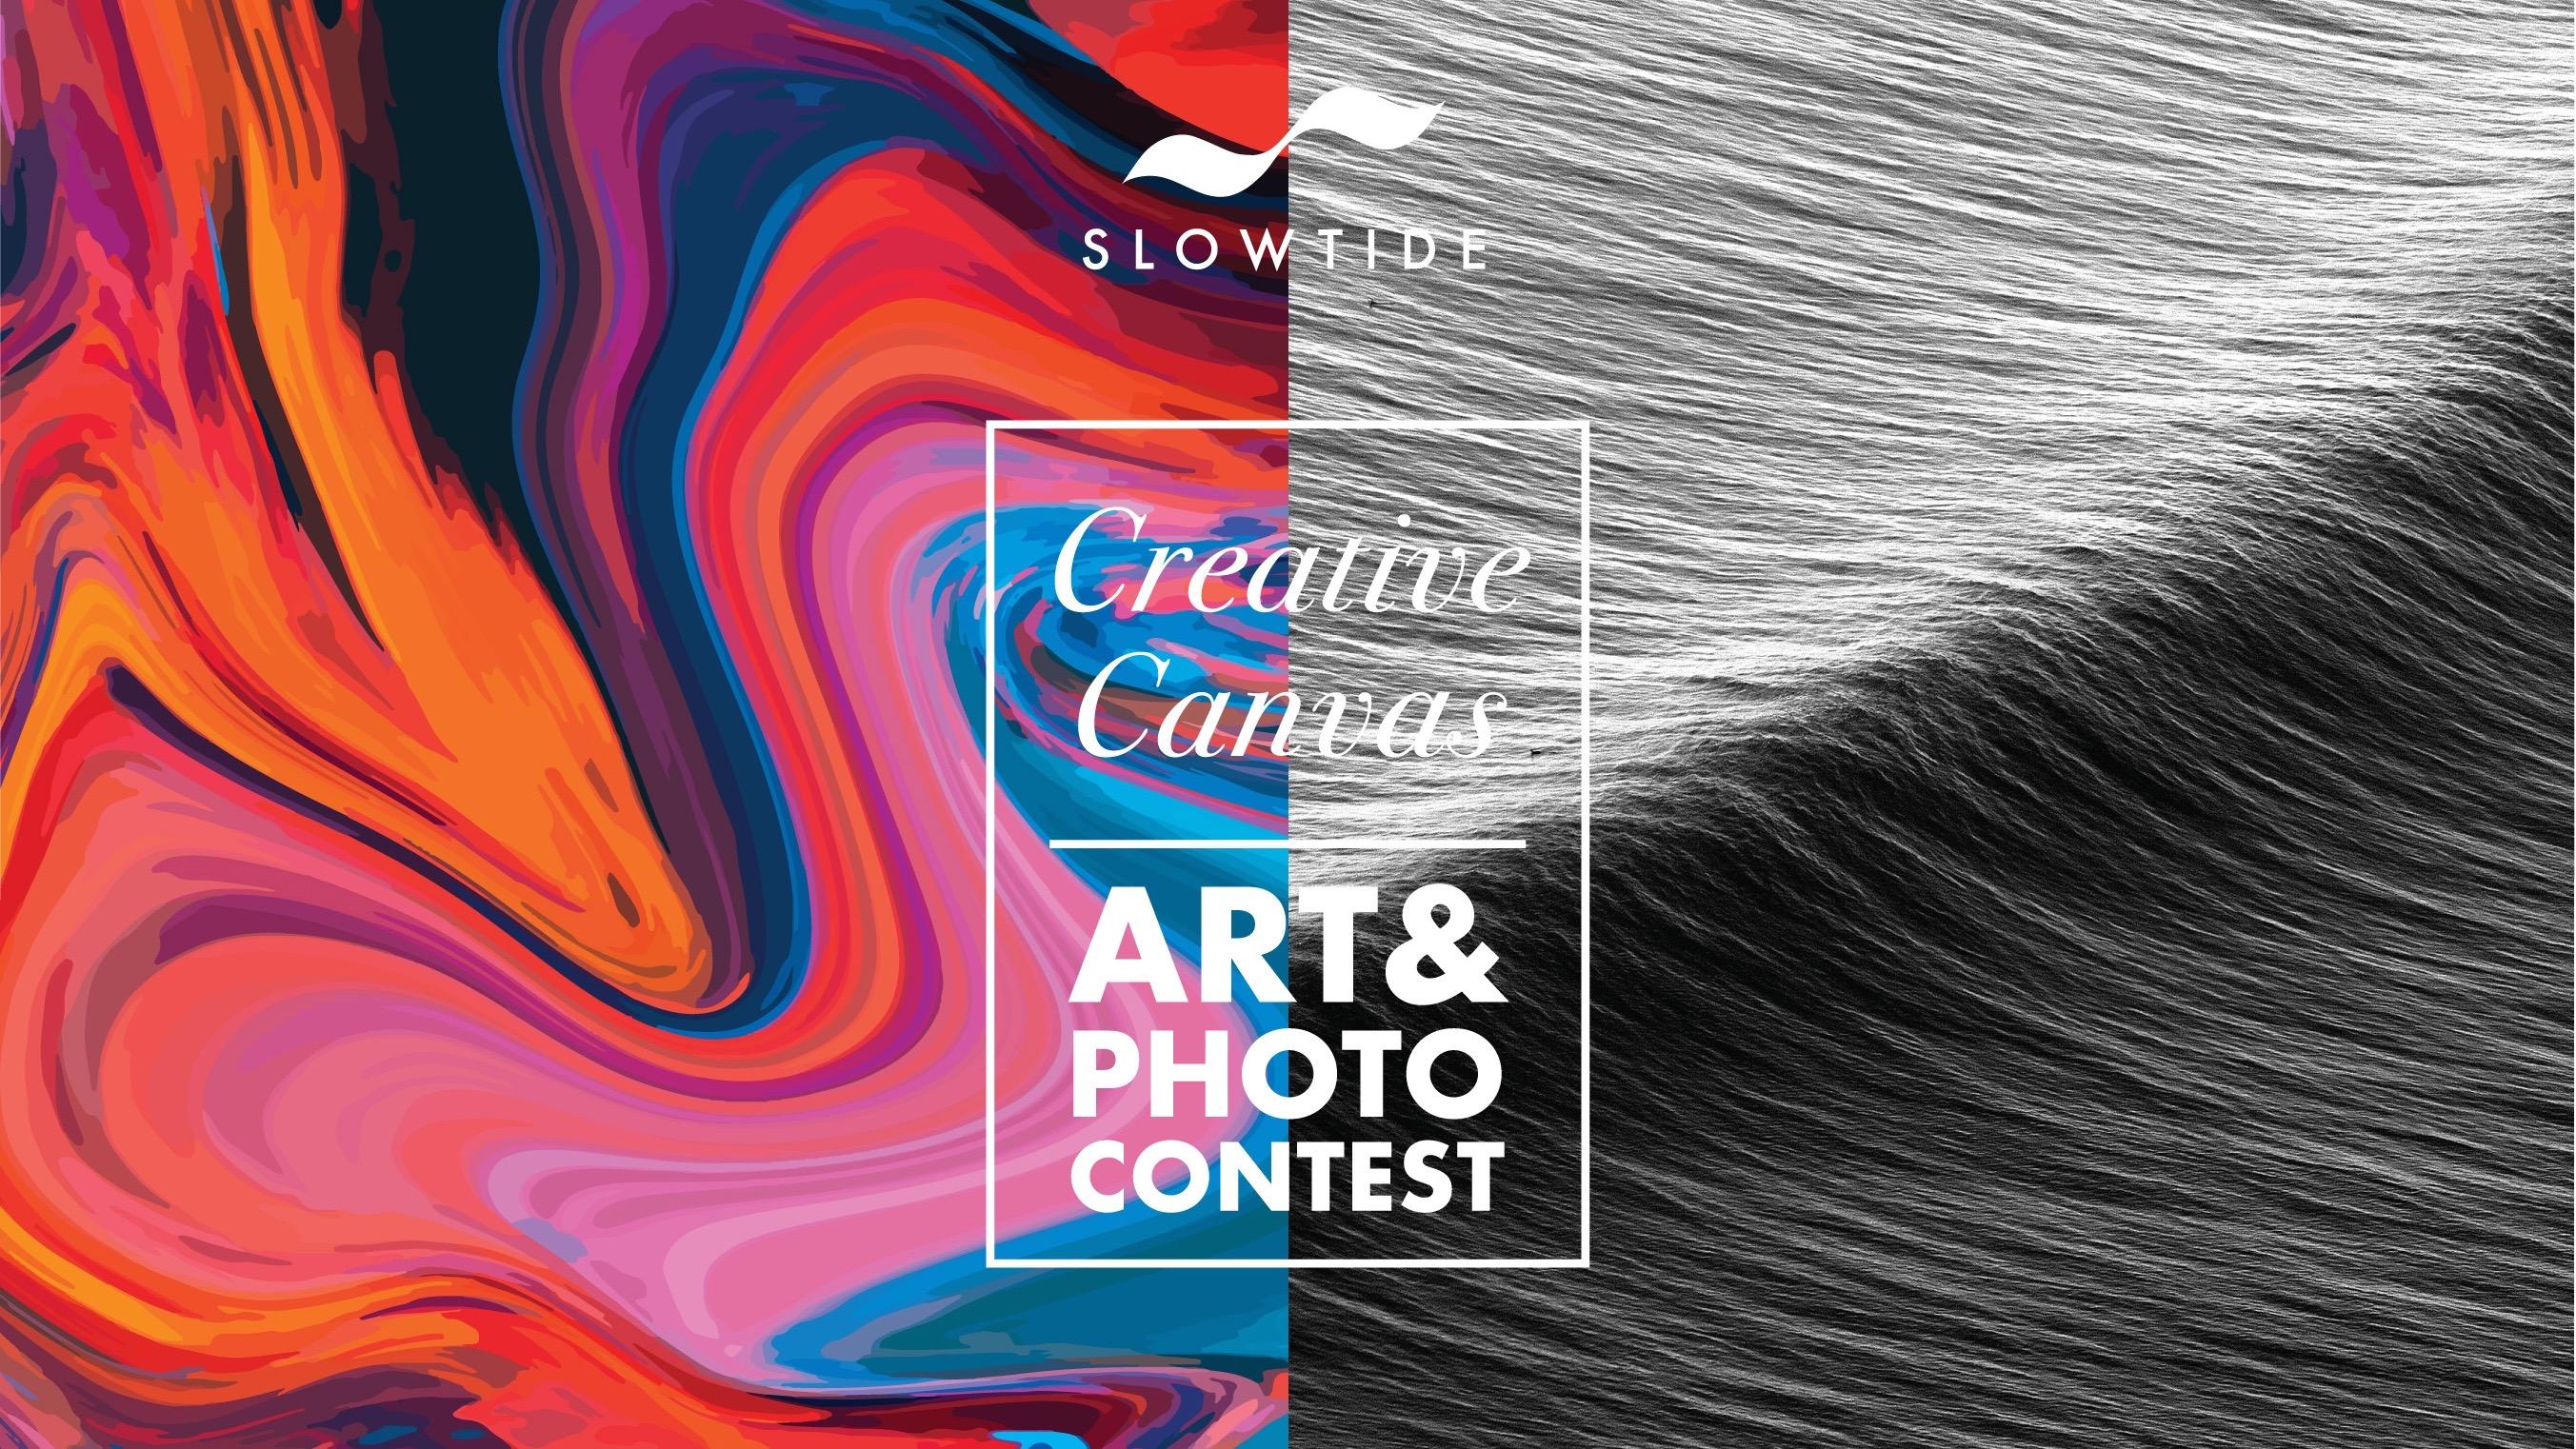 SLOWTIDE CREATIVE CANVAS CONTEST 01